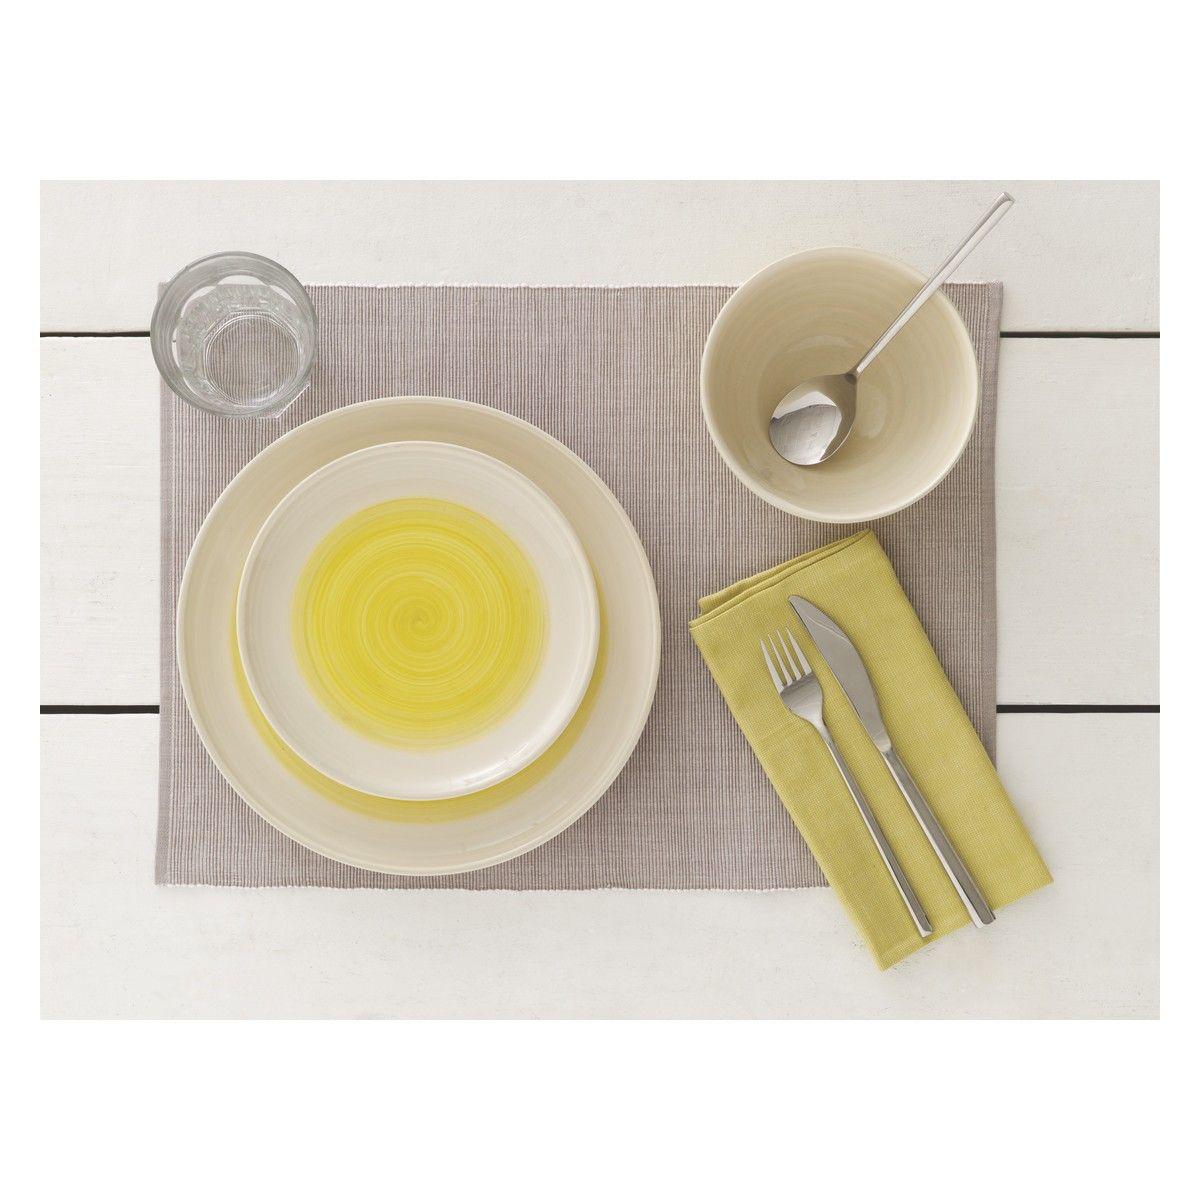 ASPRA Mirrored 24 piece cutlery set  sc 1 st  Pinterest & ASPRA Mirrored 24 piece cutlery set | Cereal bowls Yellow dinner ...